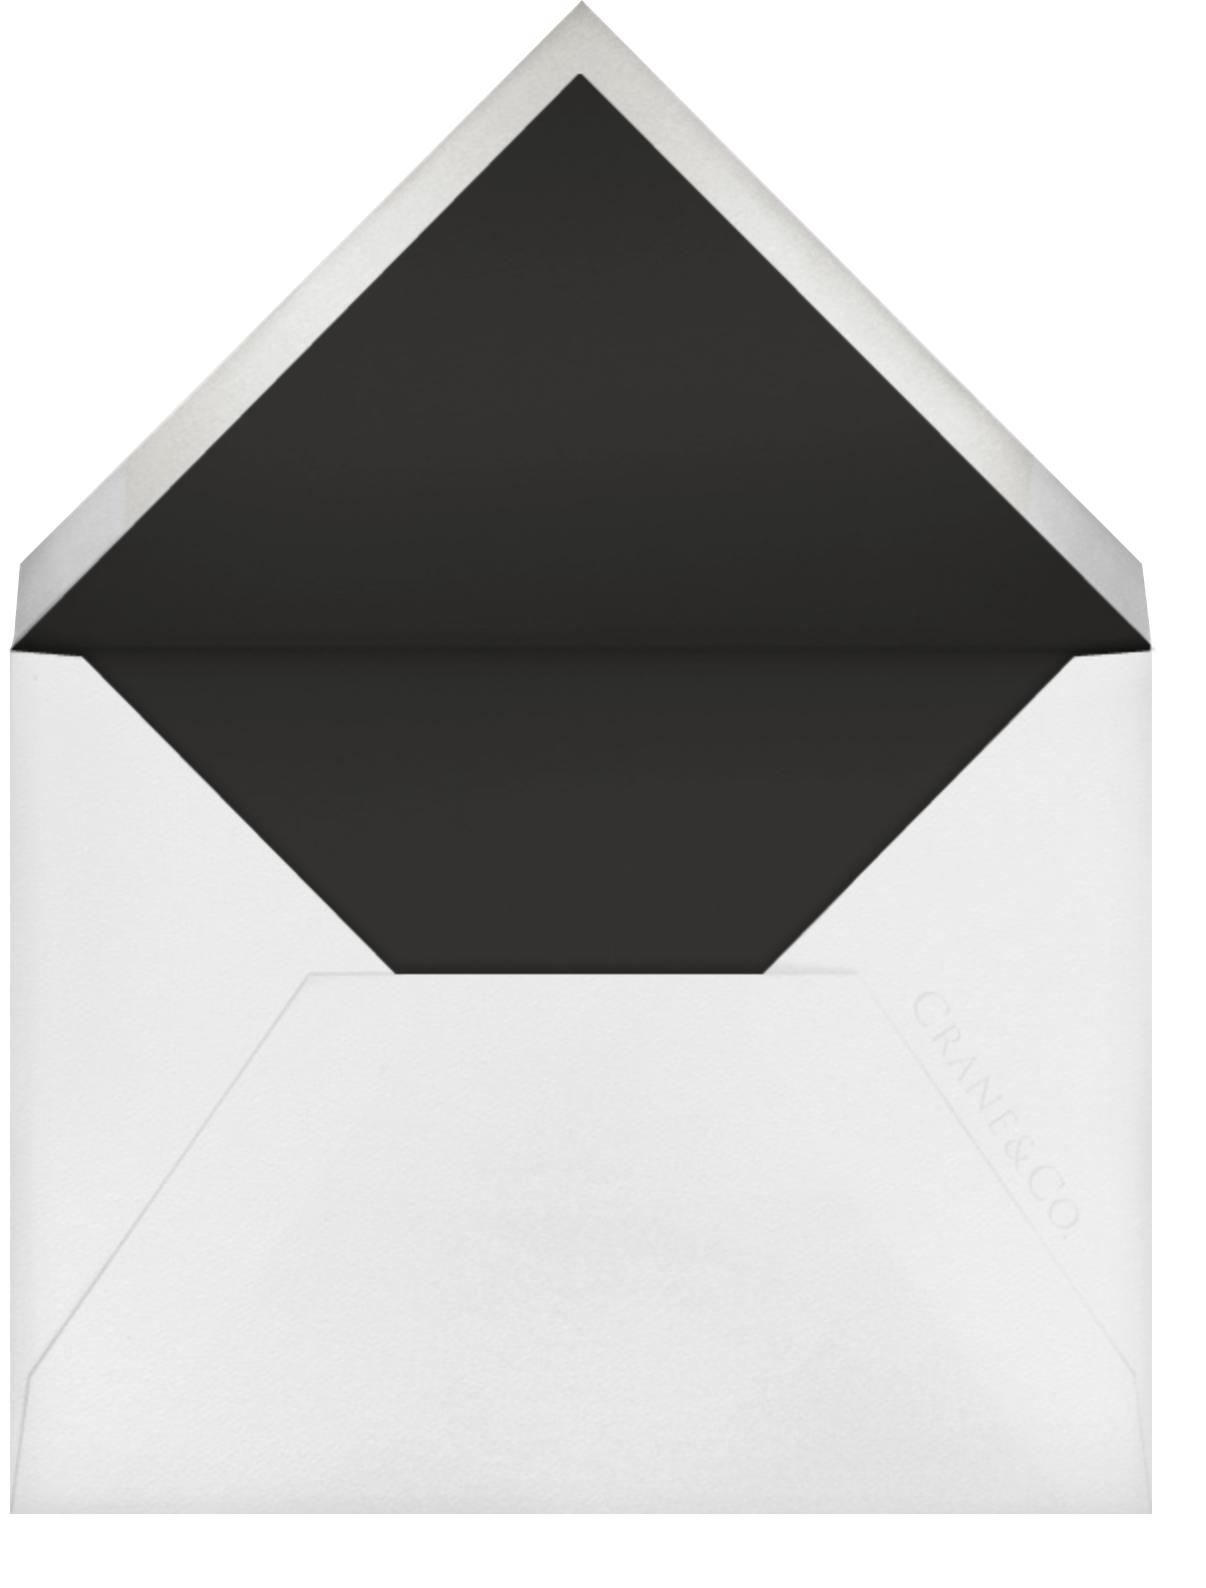 Polka Dot - Black - Oscar de la Renta - All - envelope back